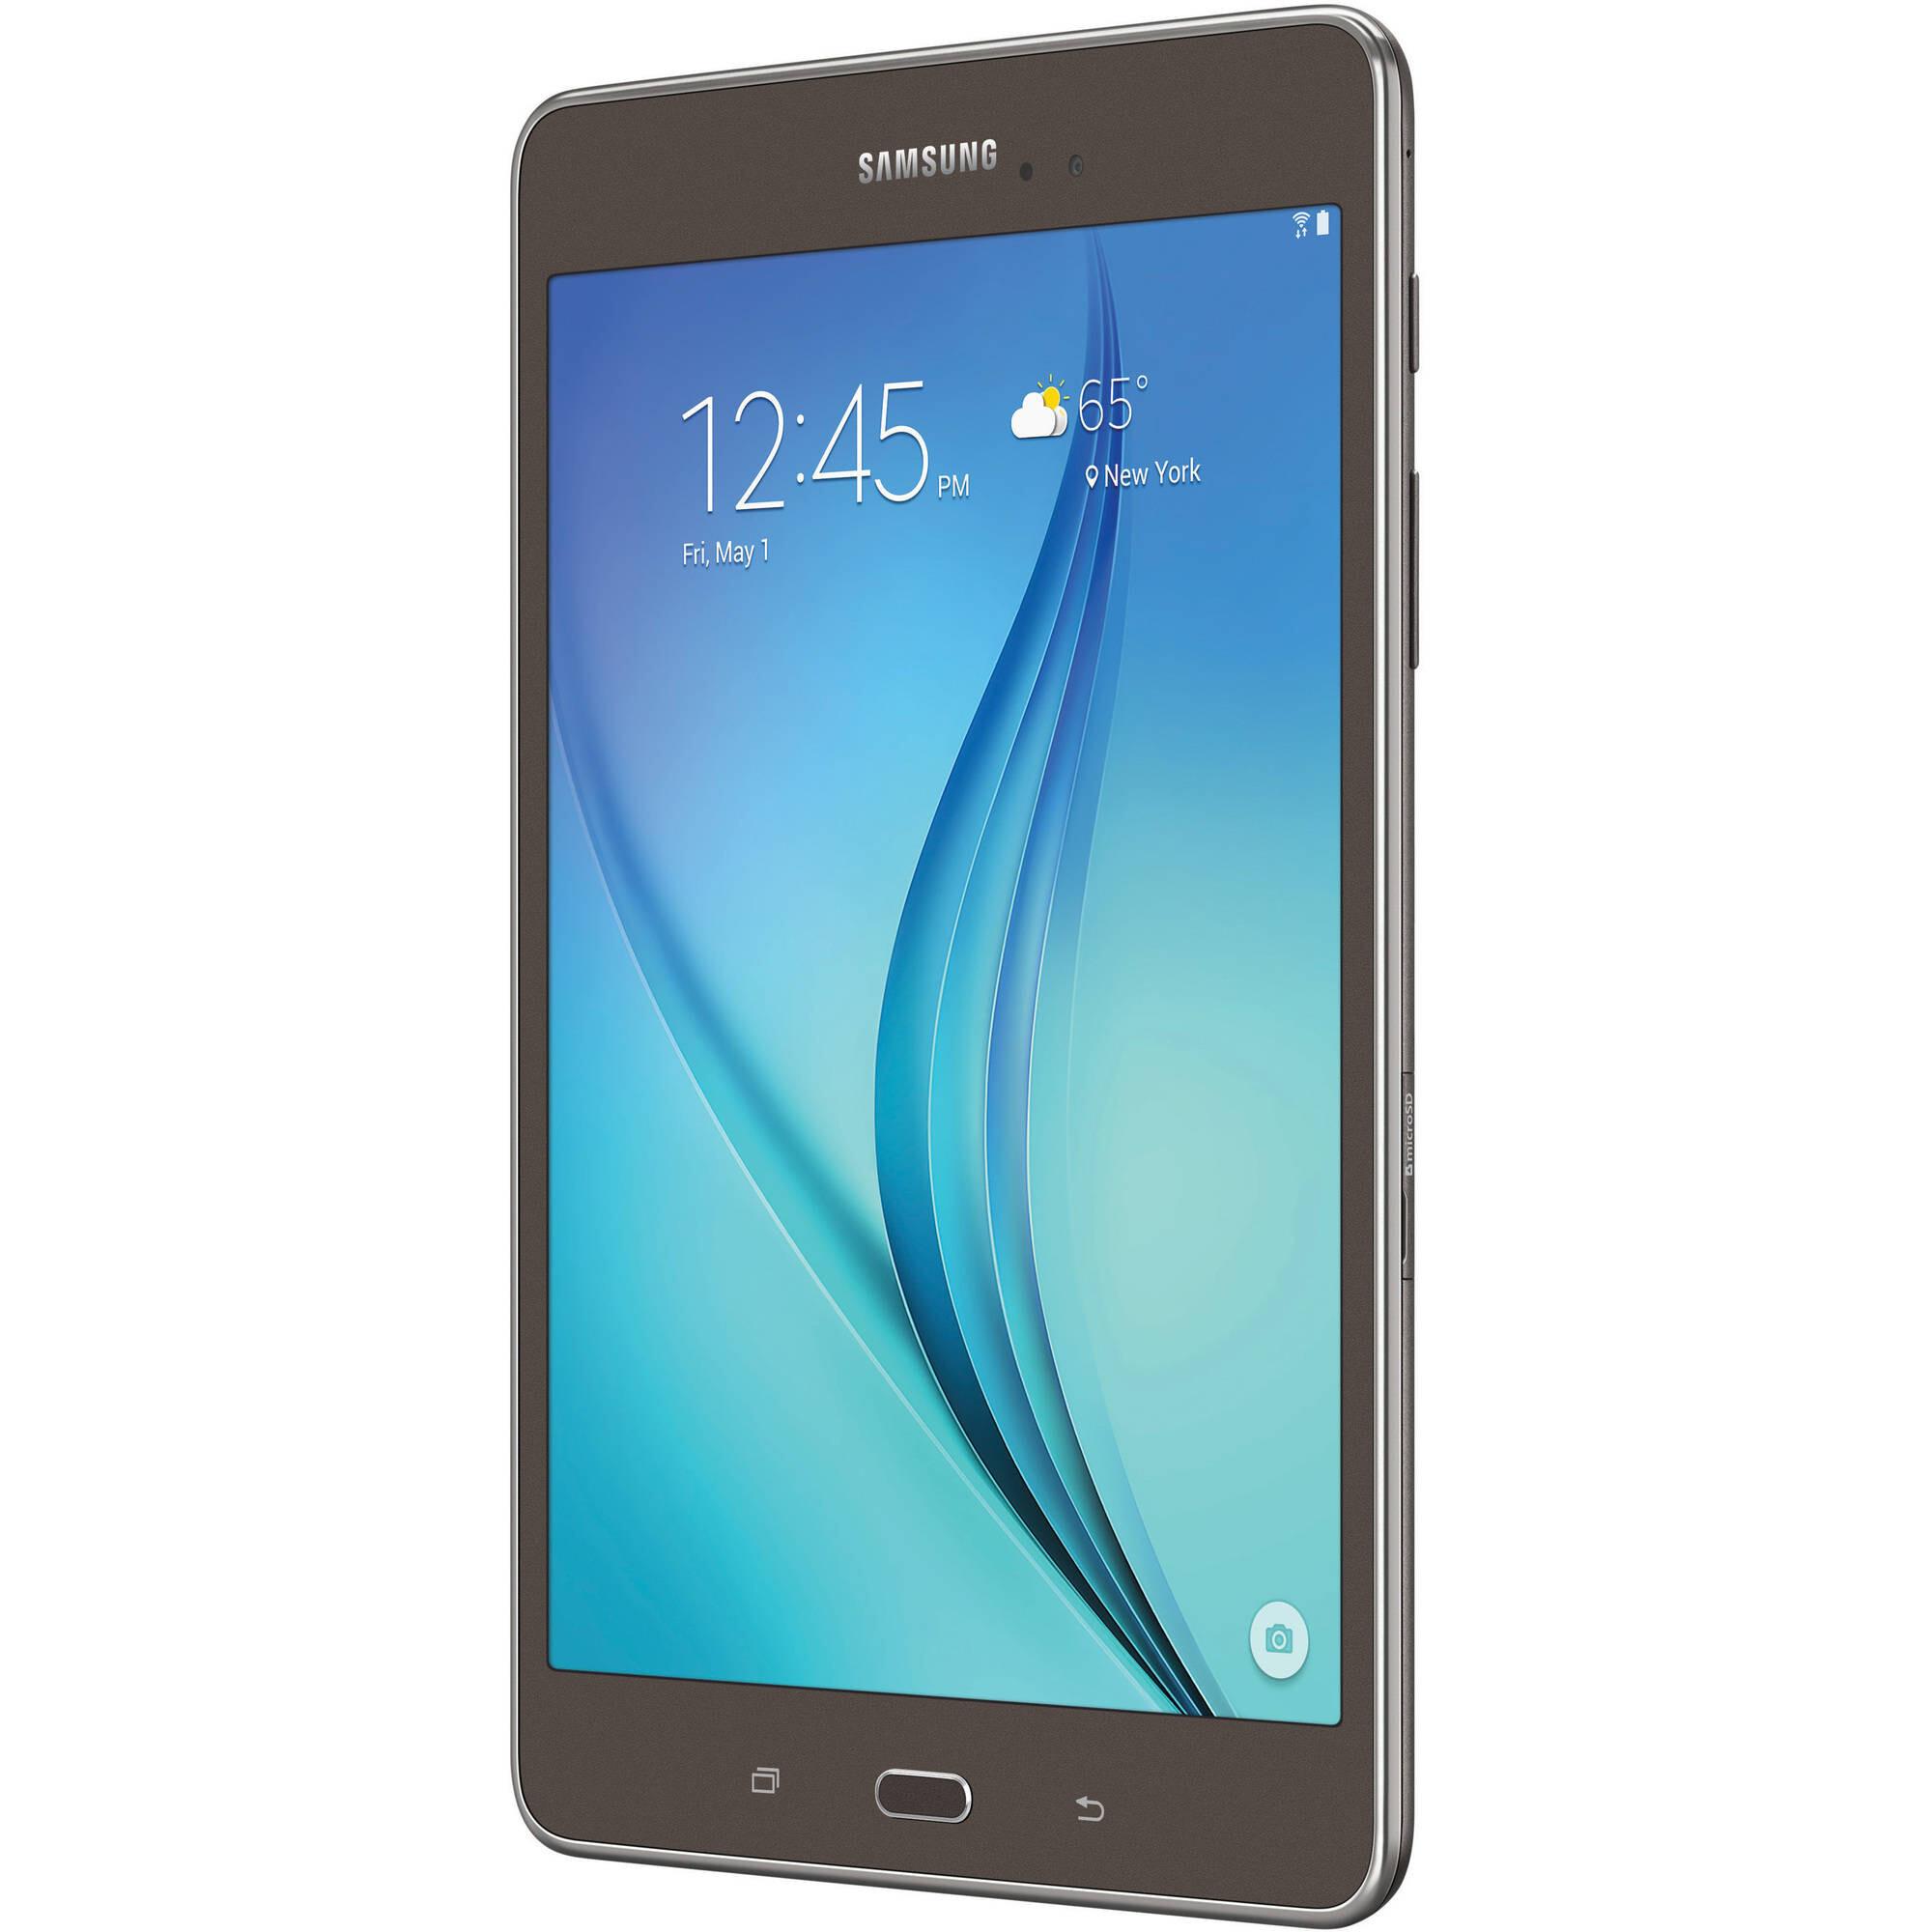 Deal Refurbished Samsung Galaxy Tab A 80 Discounted By